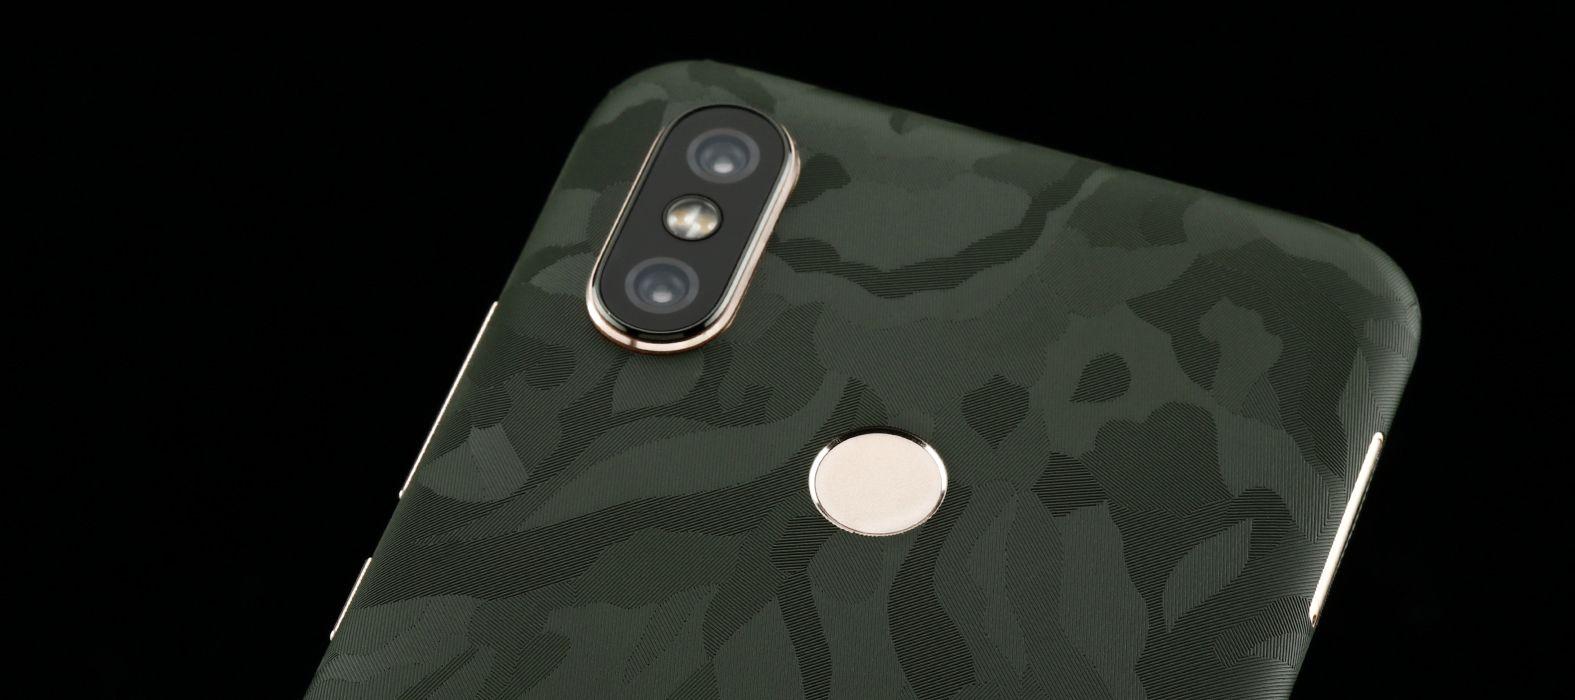 Xiaomi Mi A2 Green Camo Skins